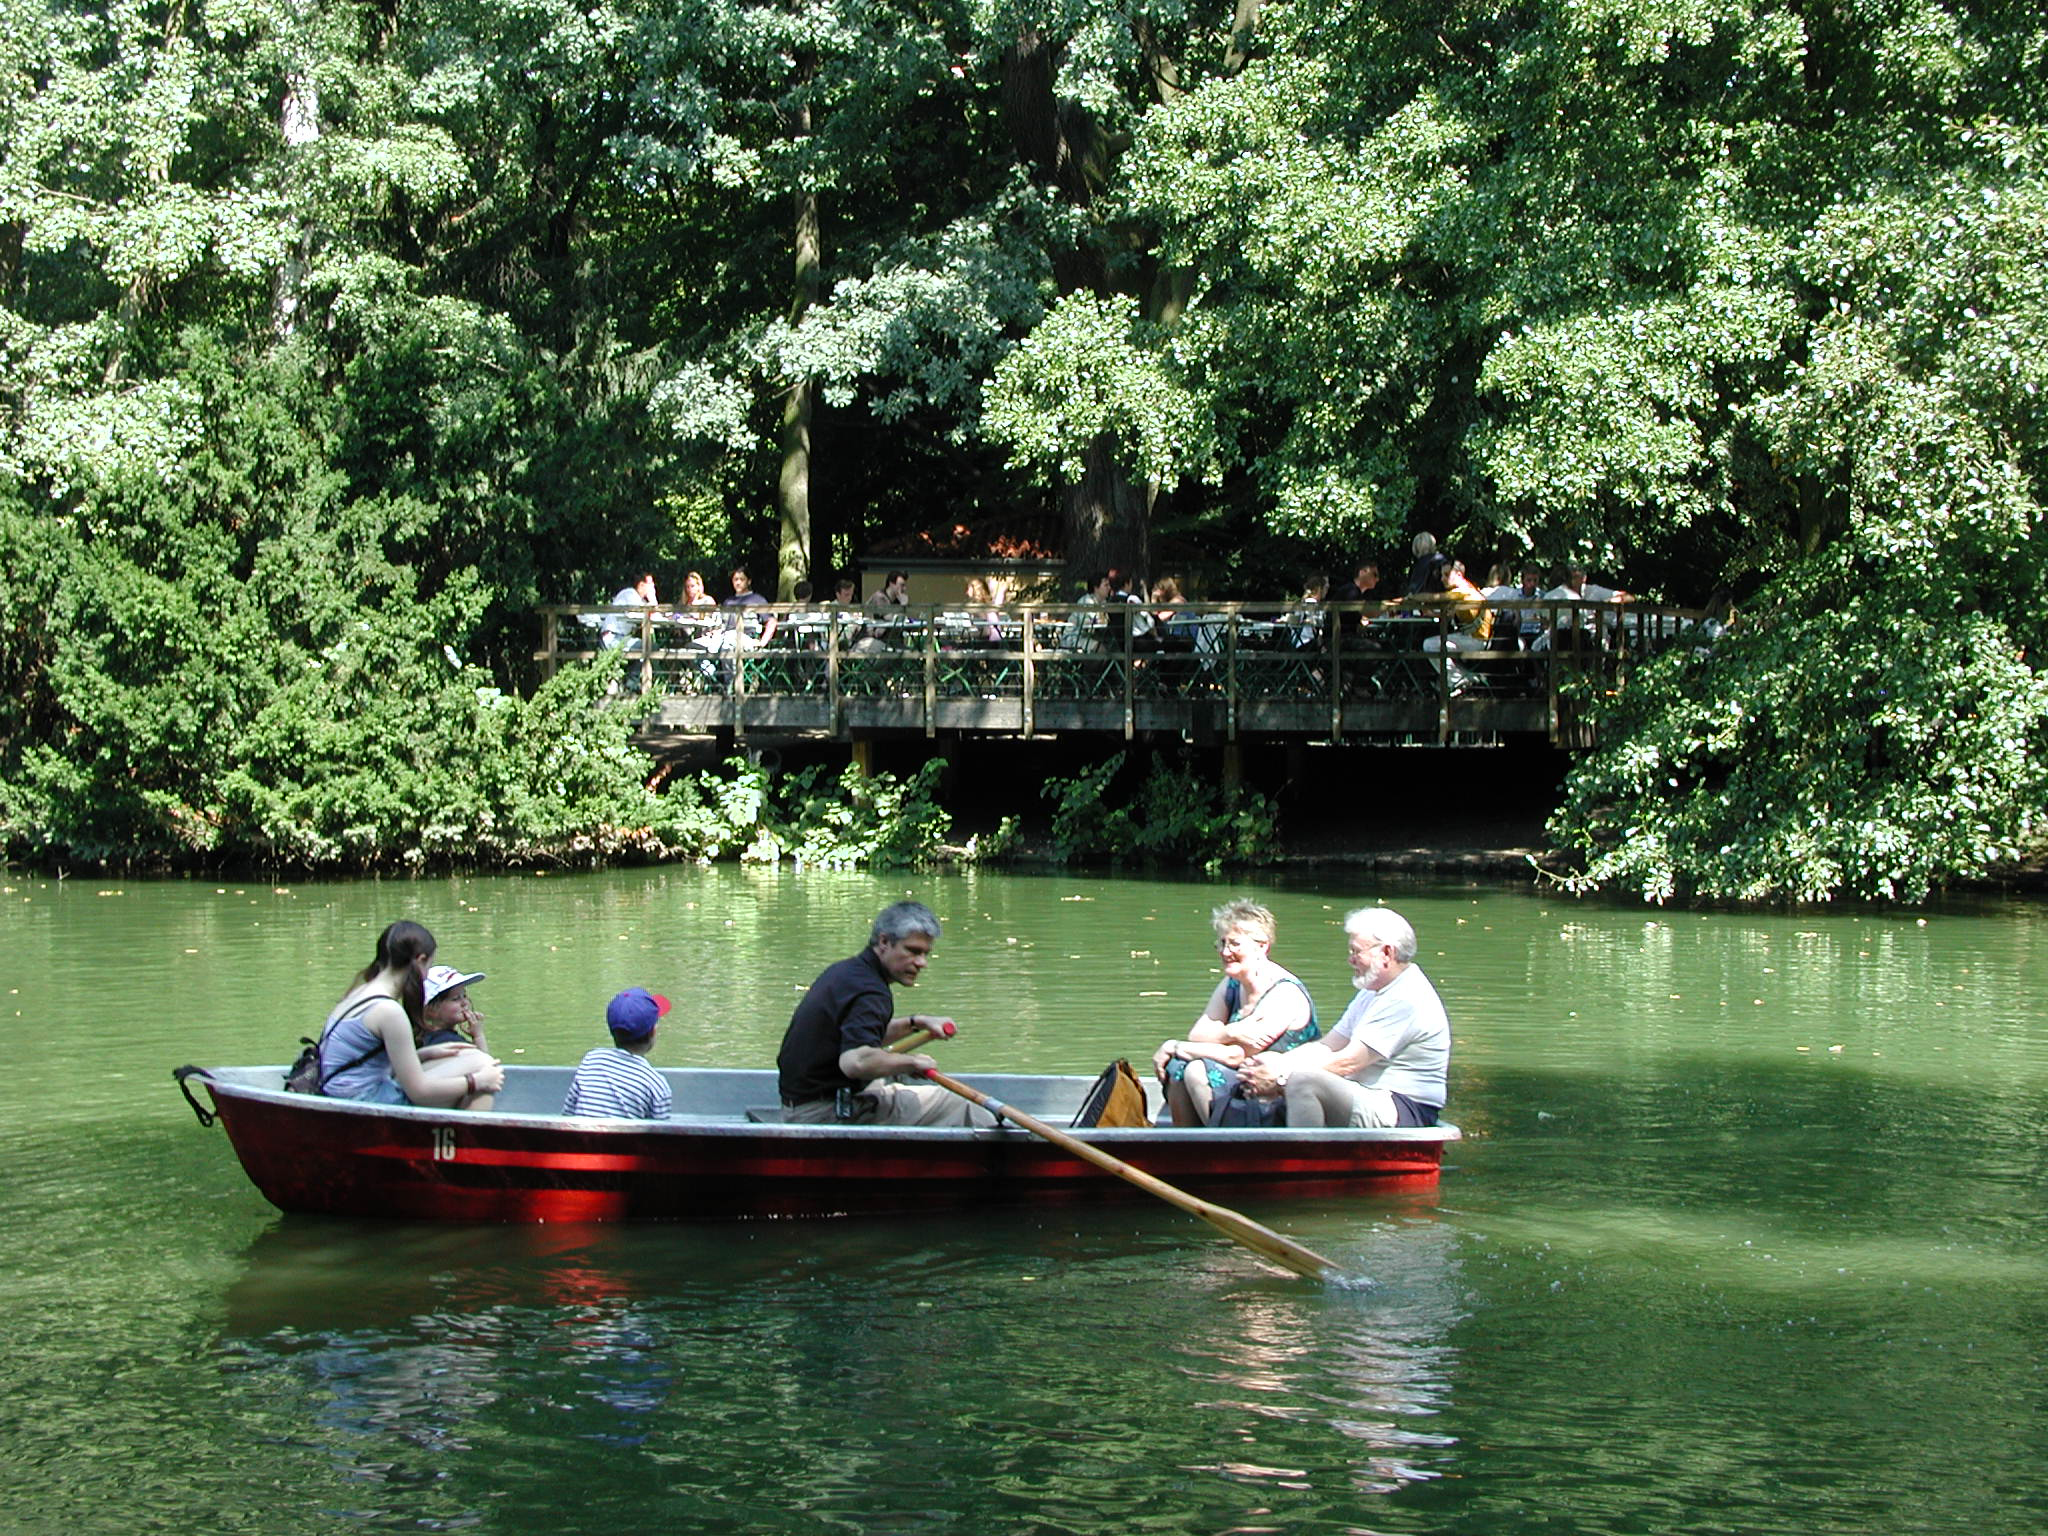 Rowing in Tiergarten, ╕ visitBerlin, Foto Tanja Koch.jpg